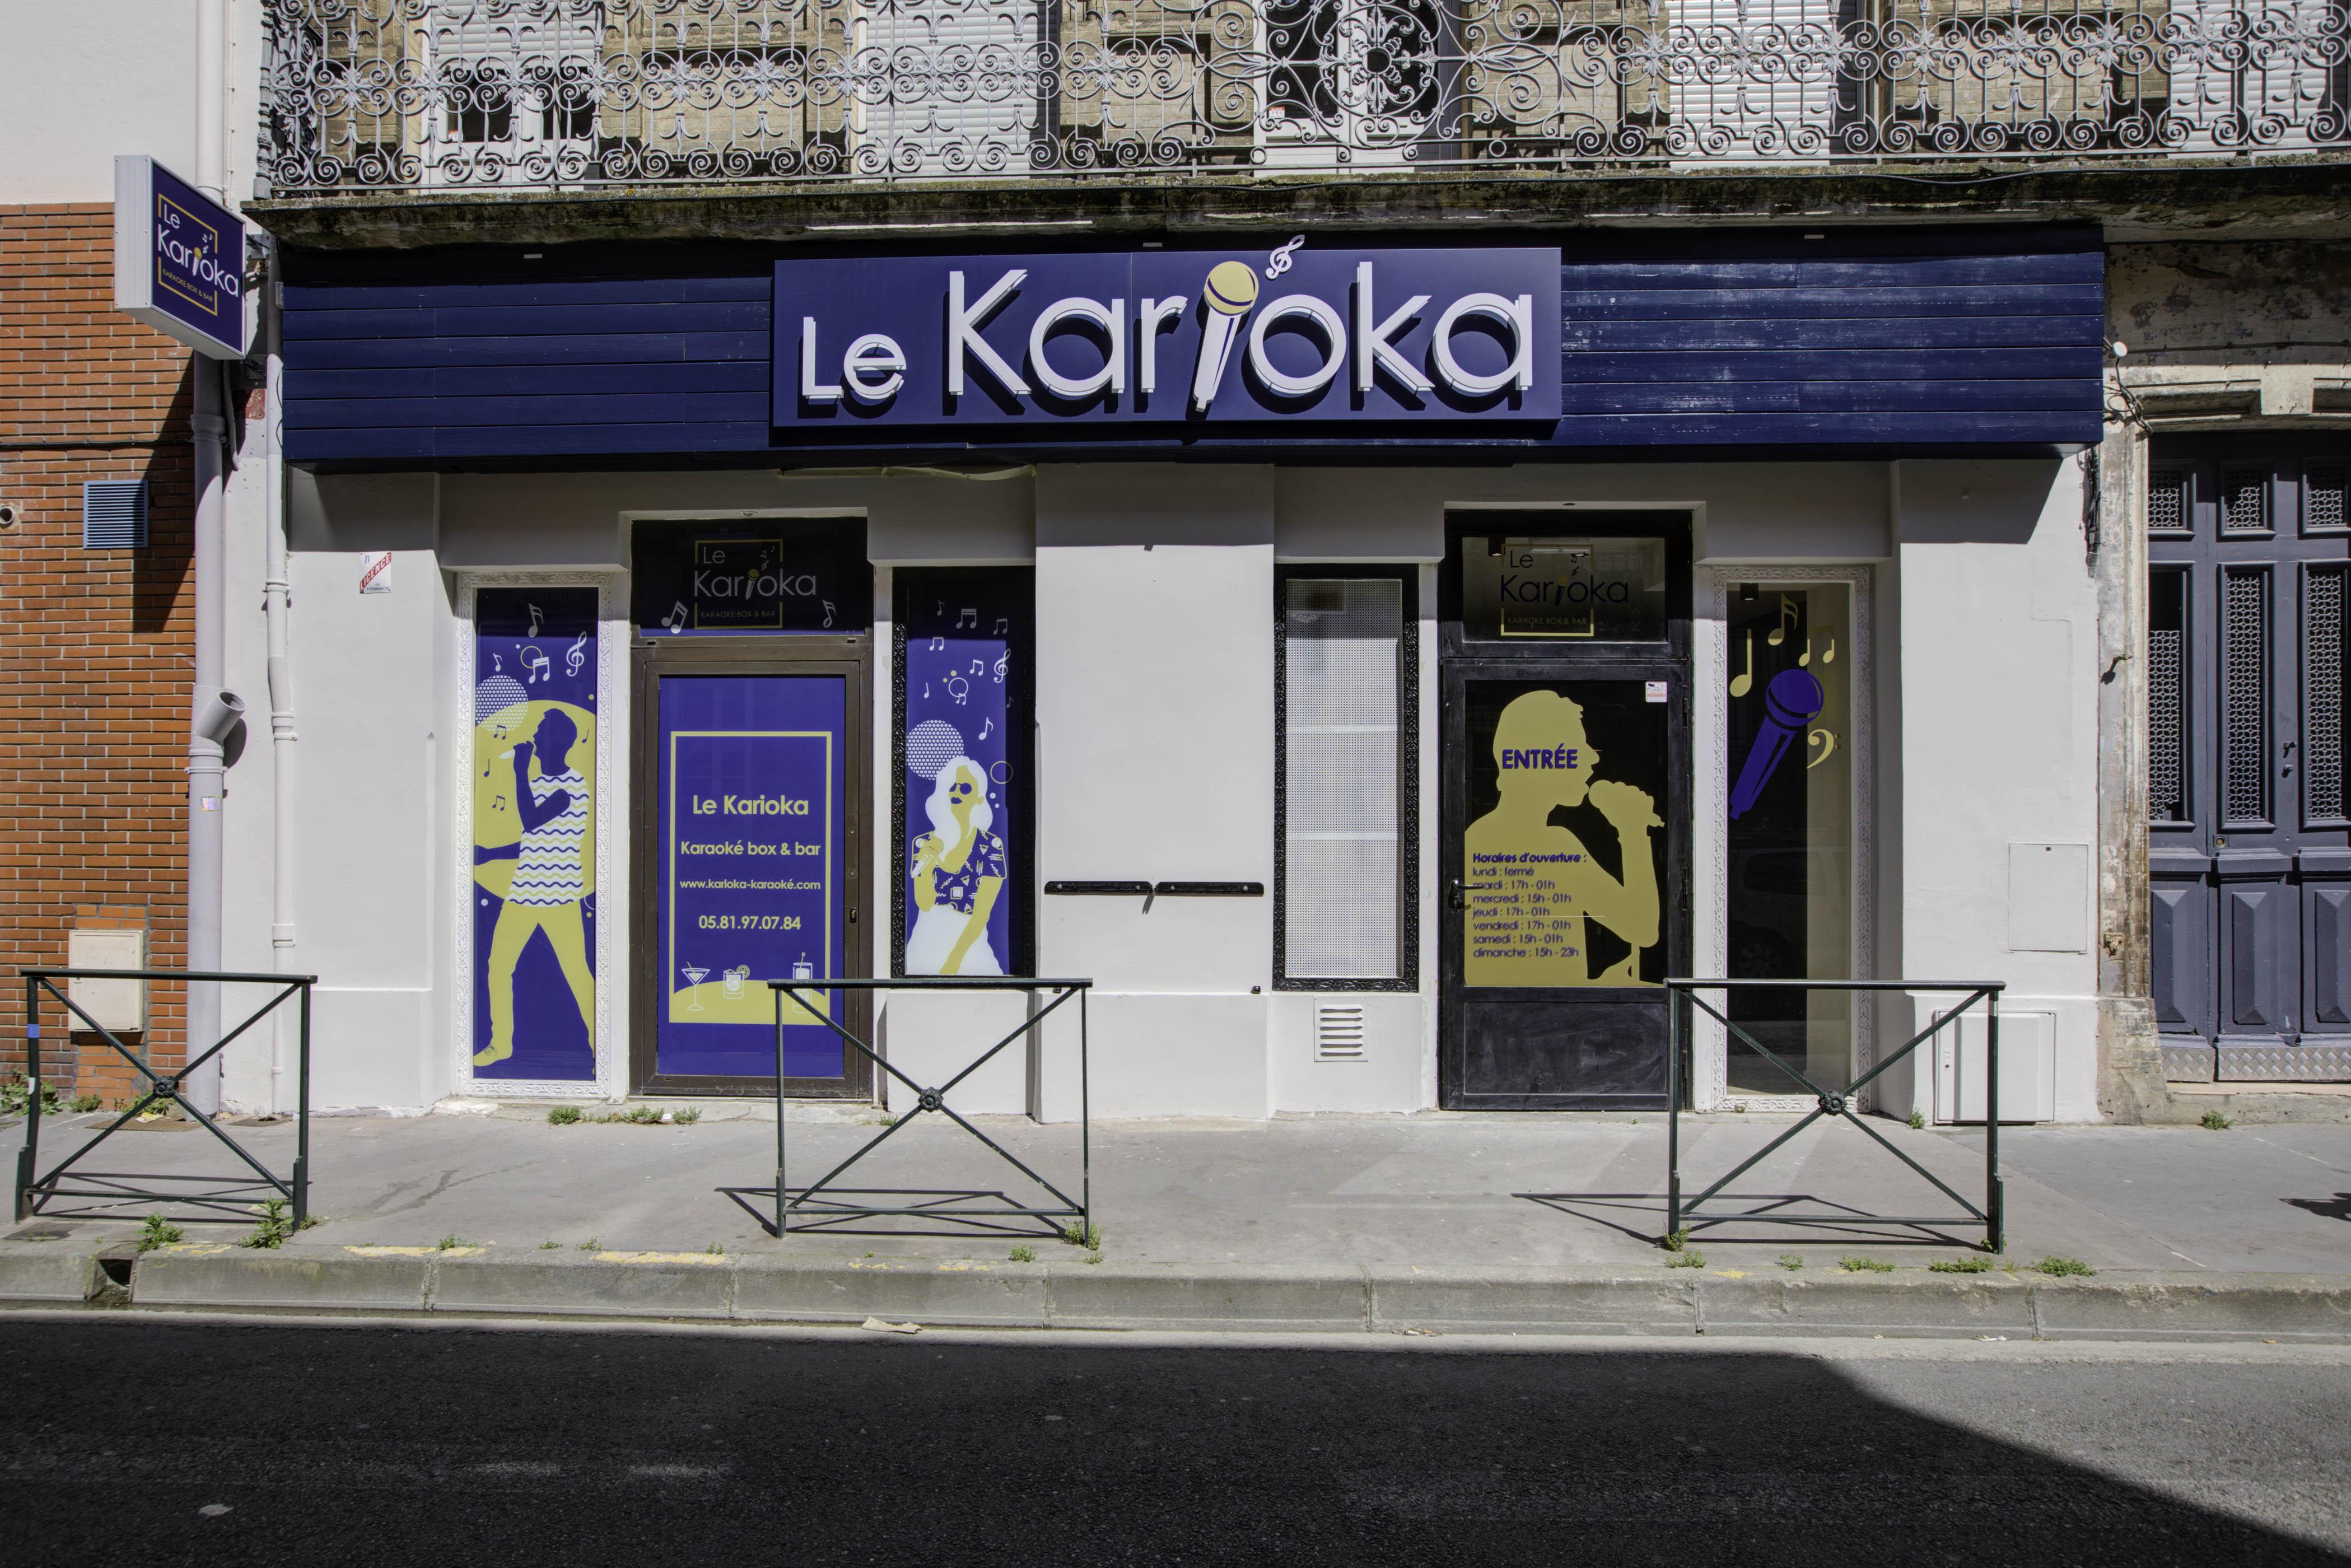 Façade rénovée du bar Karaoké le Karioka à Toulouse